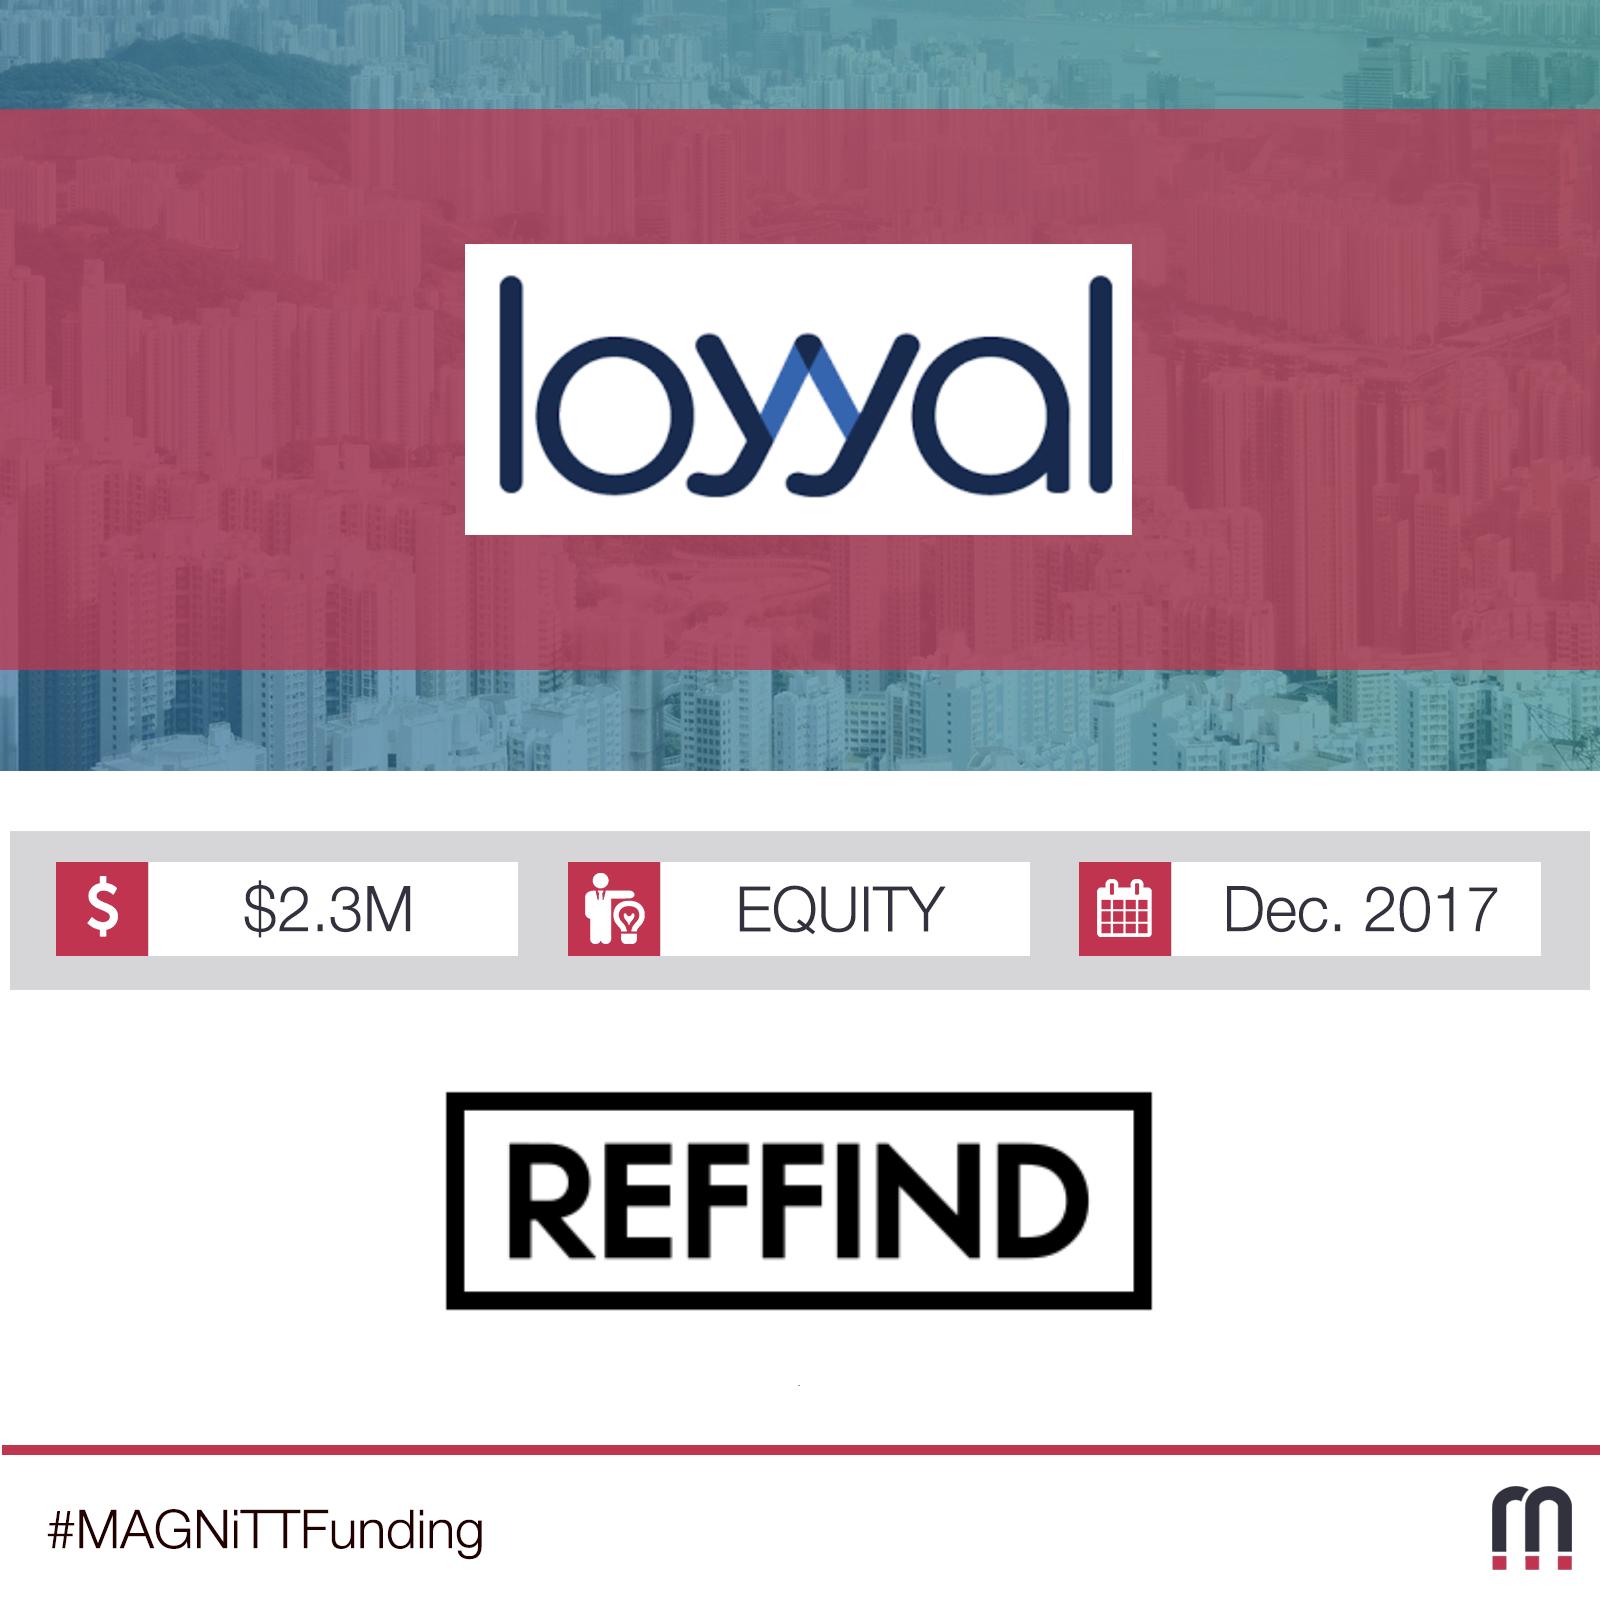 Australia's REFFIND just bought into US blockchain leader Loyyal Corporation